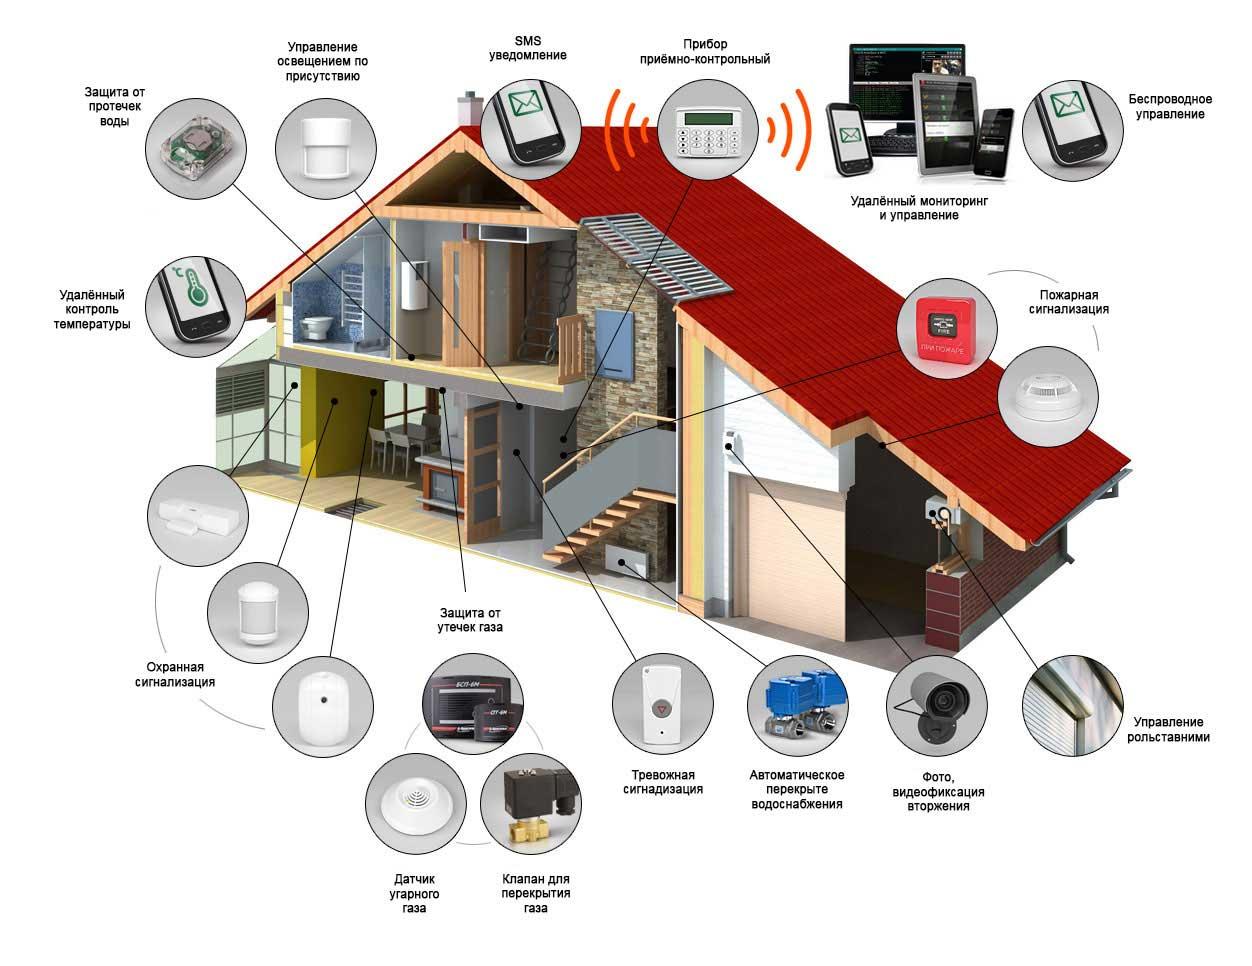 Схема установки сигнализации 2